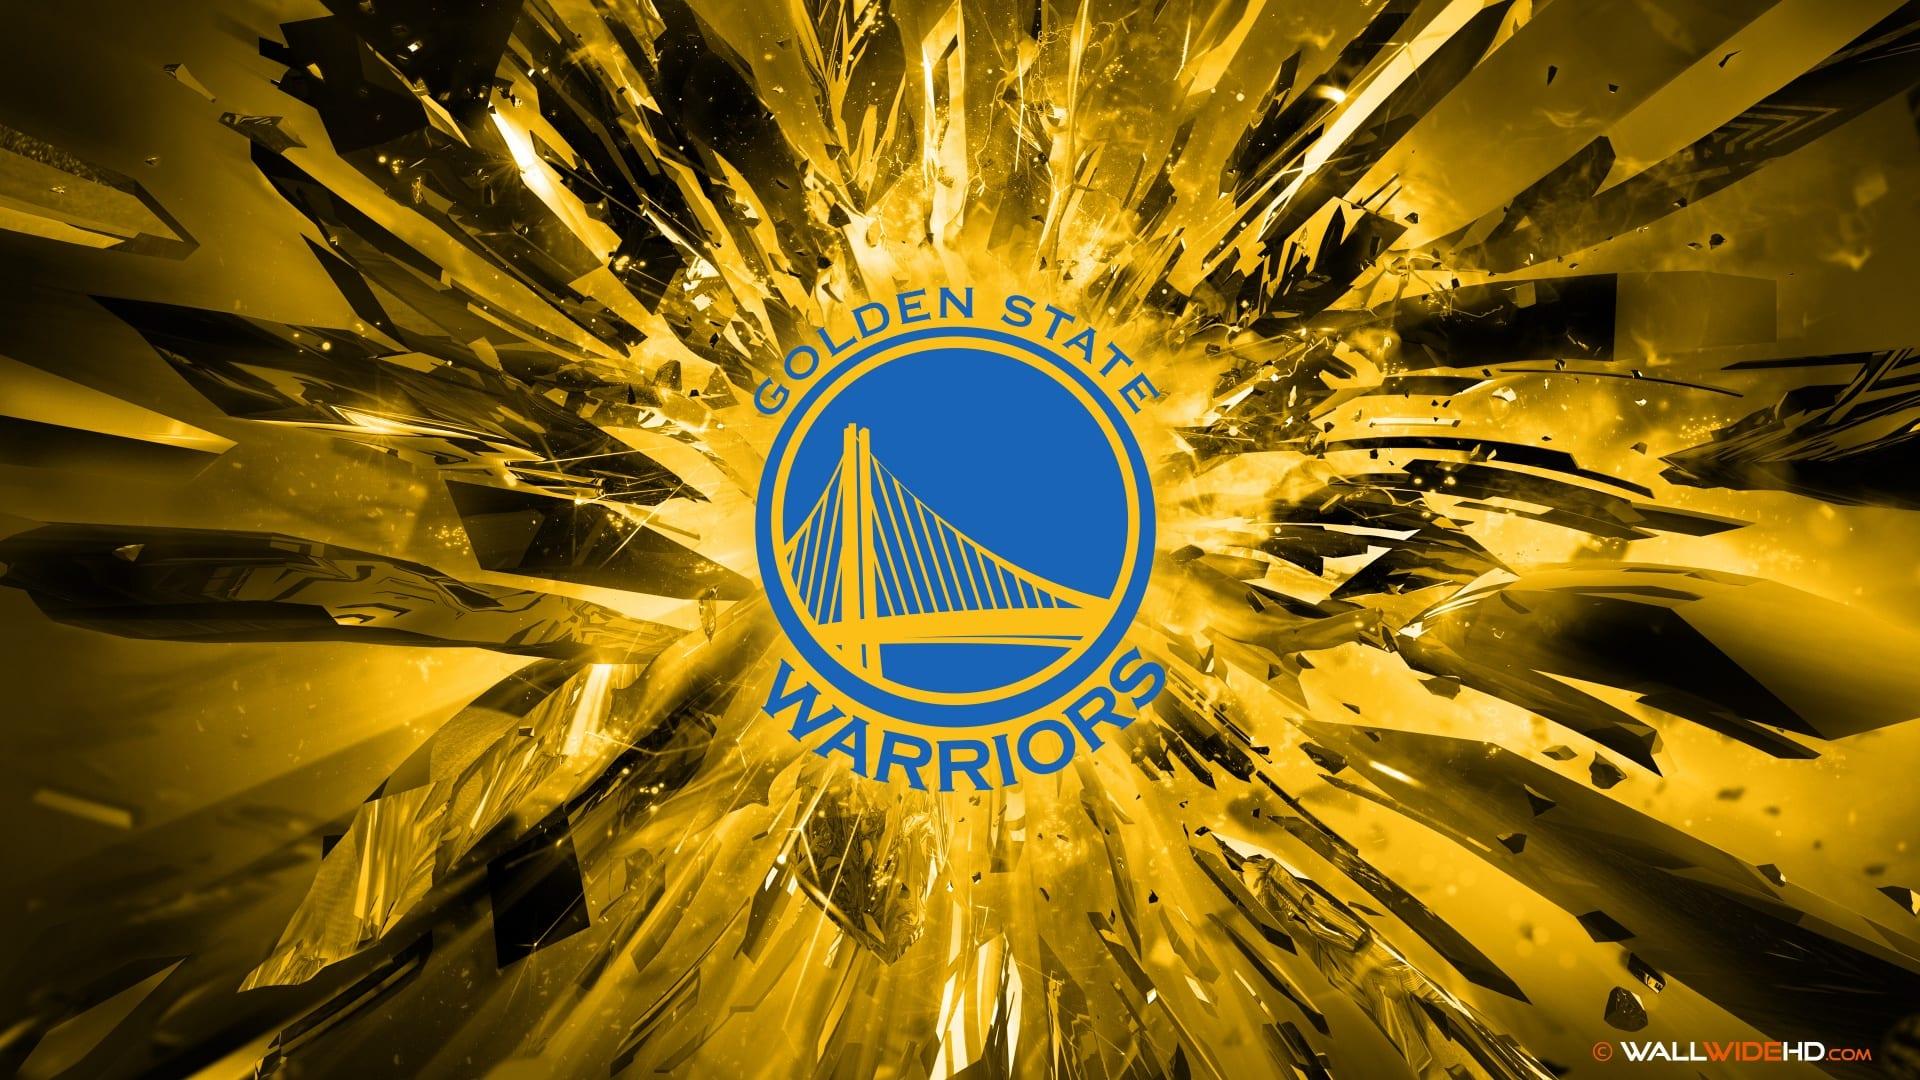 Golden State Warriors 2015 Logo 4K Wallpaper